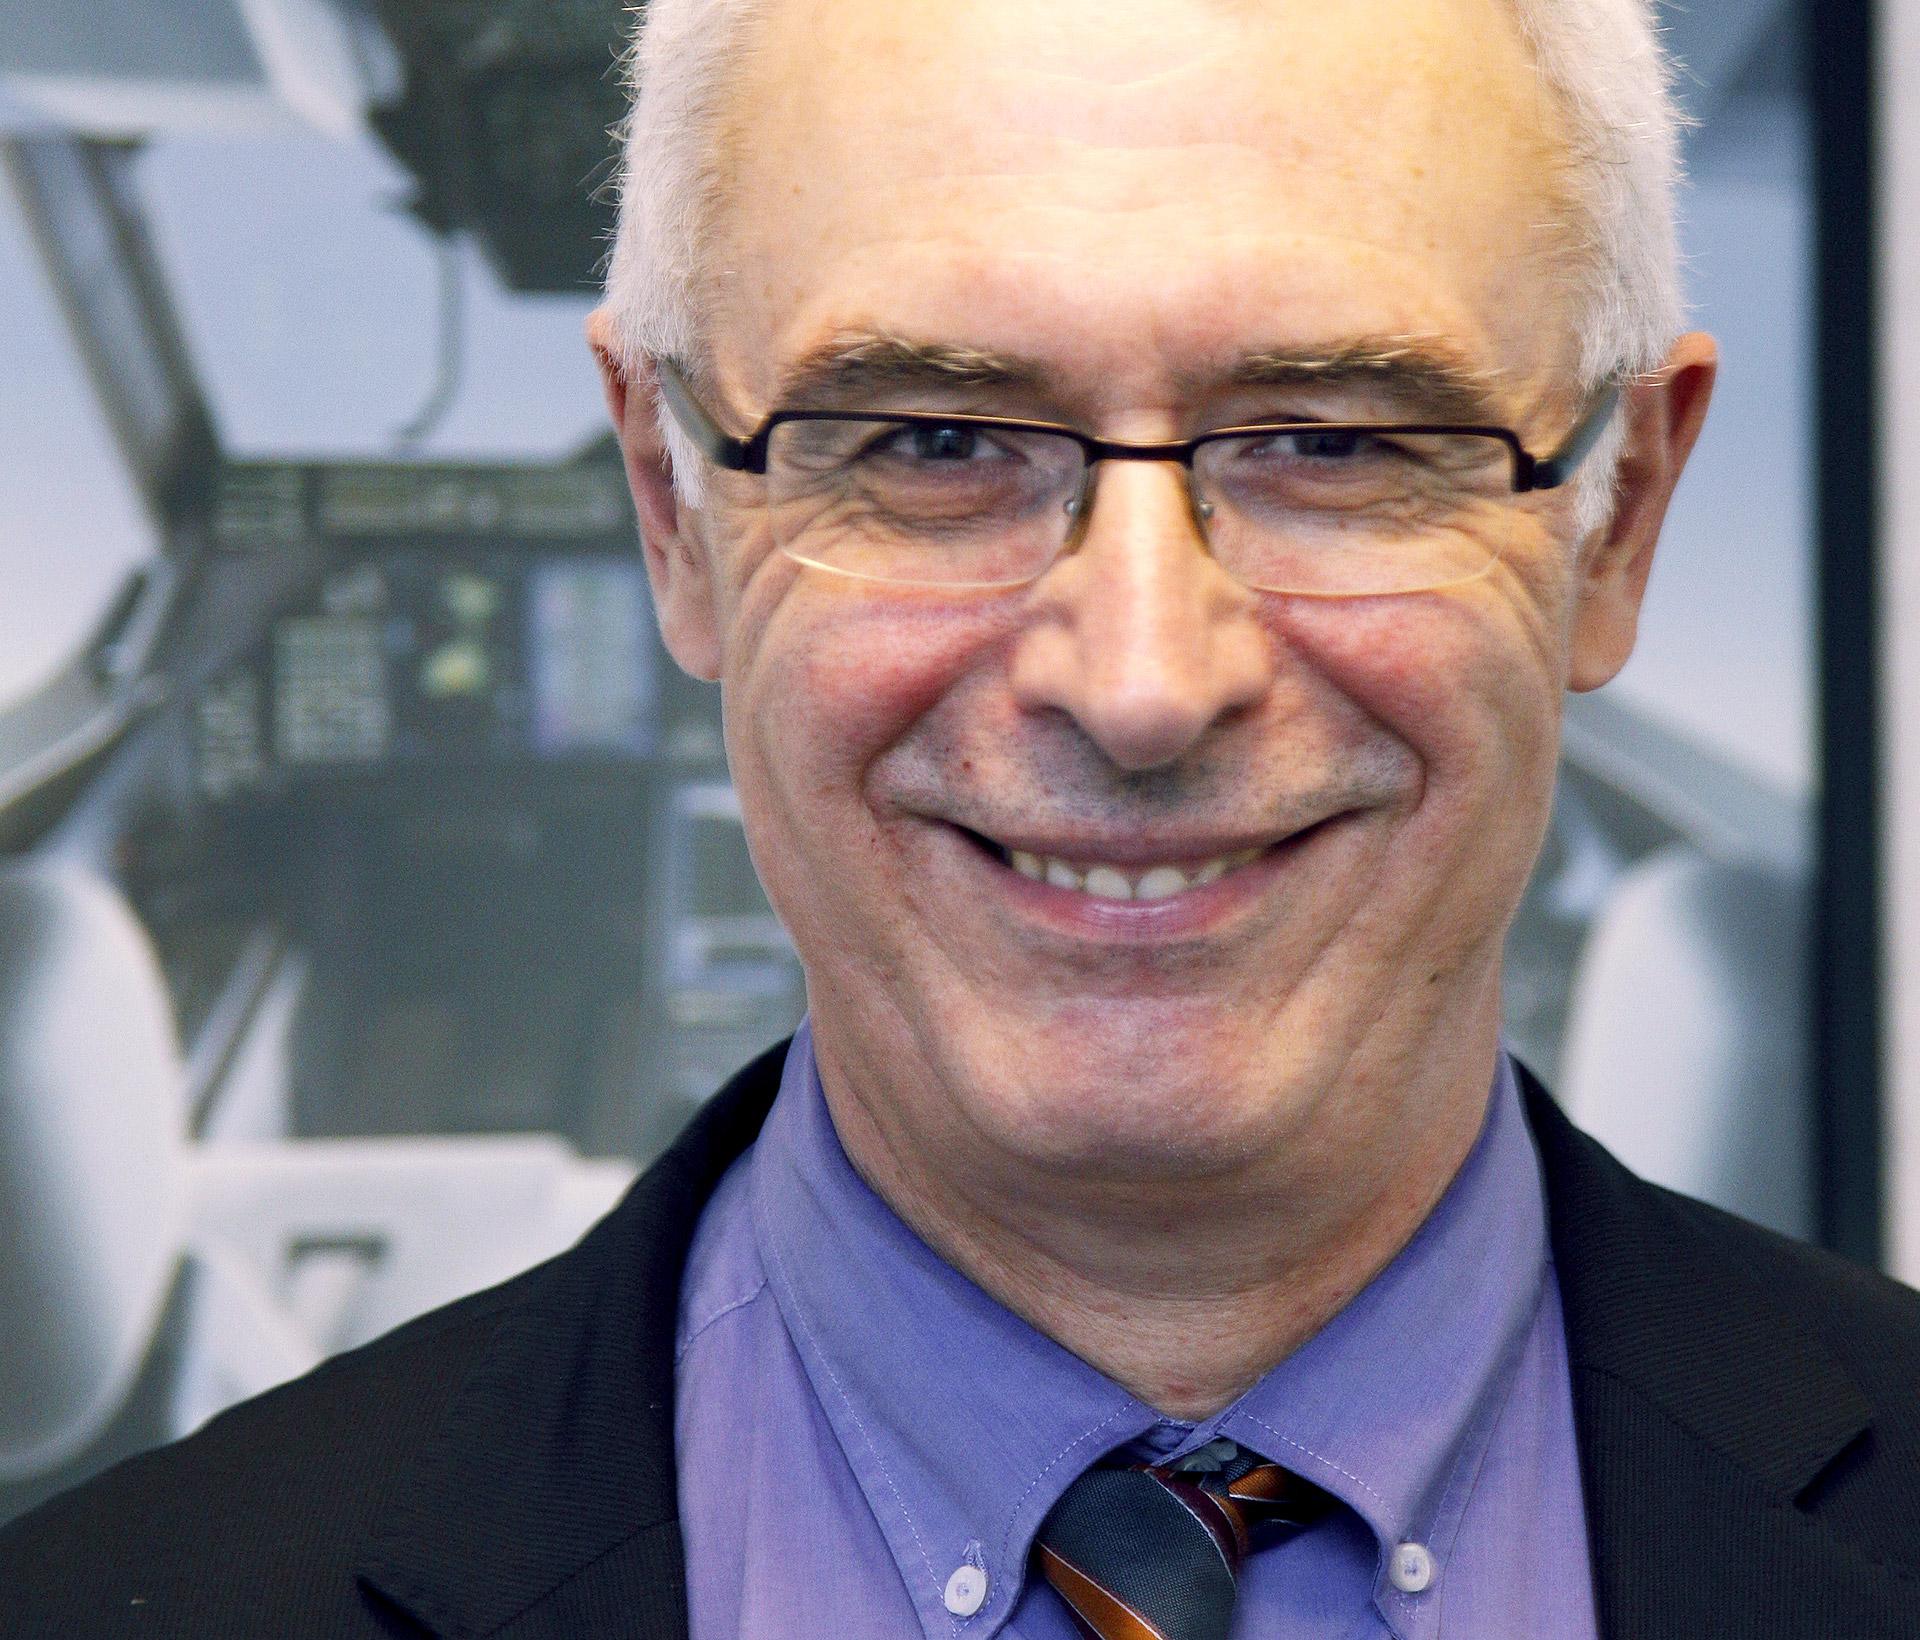 Norbert Dubost, PDG de Thales, les leader en équipement embarqué et terrestre